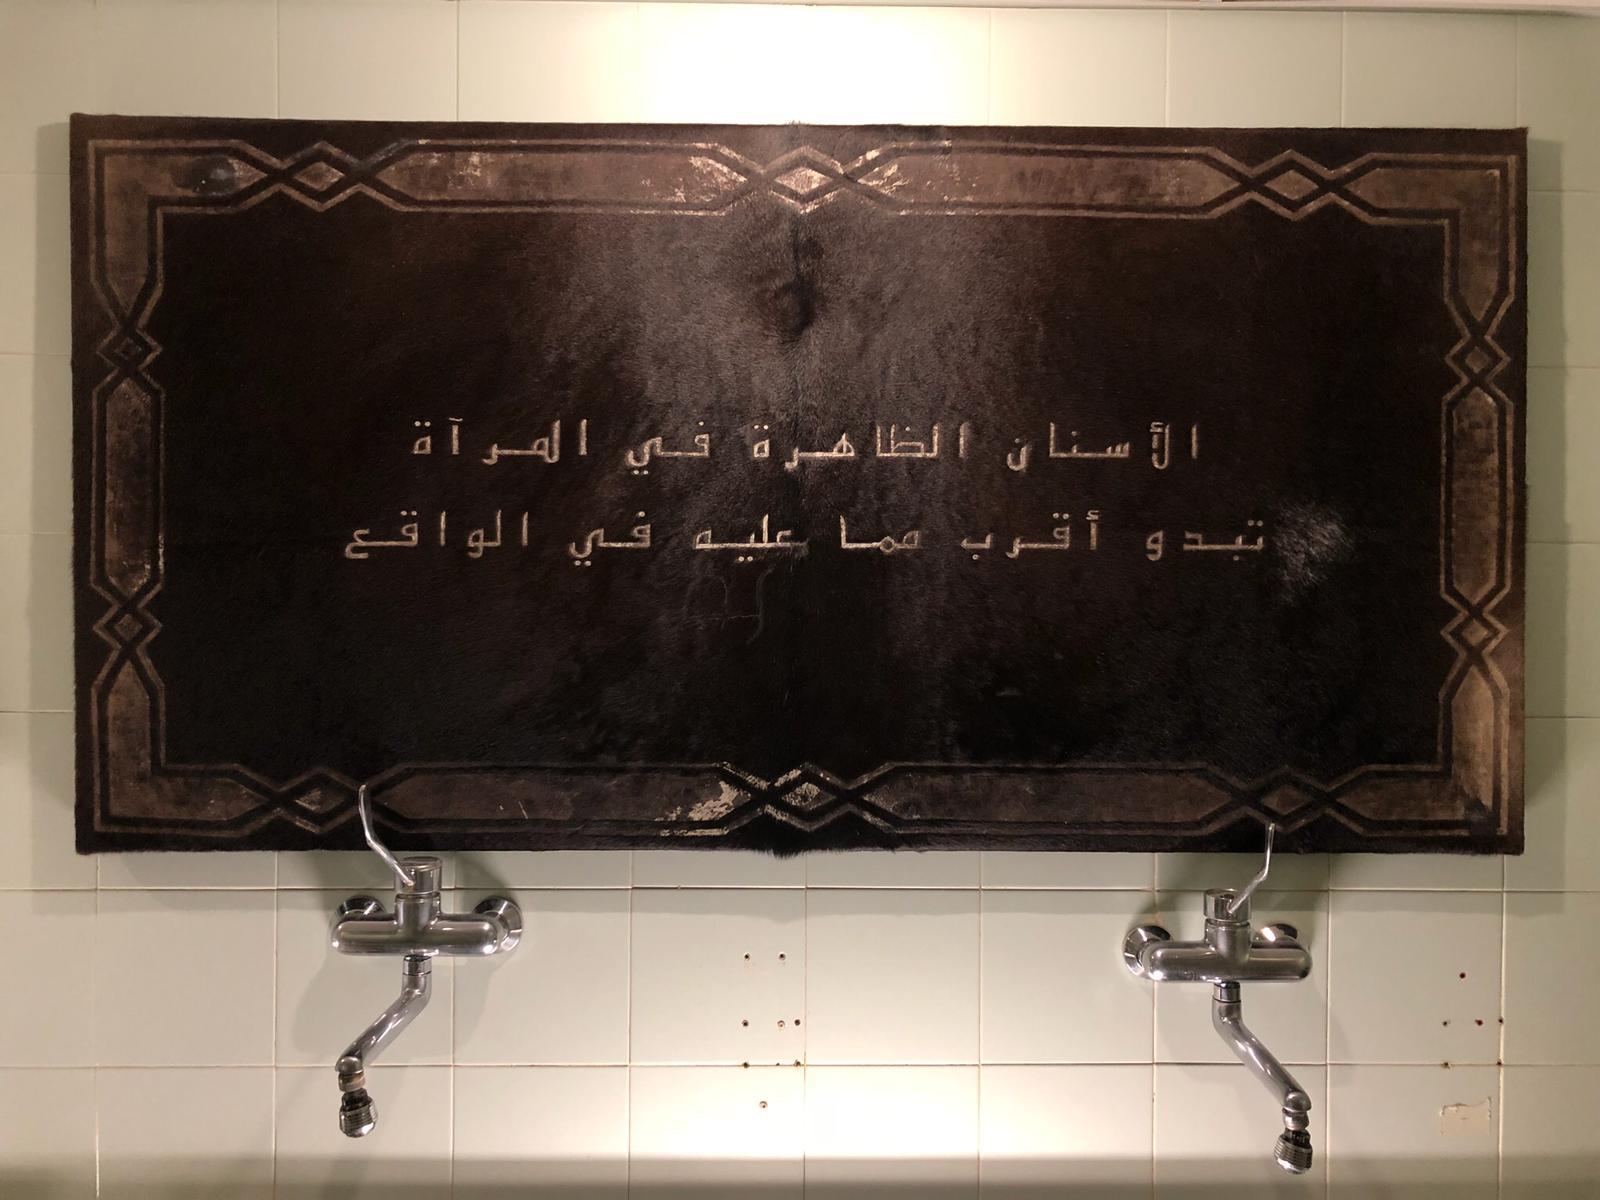 Skin Mirror II, Fadi Al-Hamwi, Cow Hide, 2018